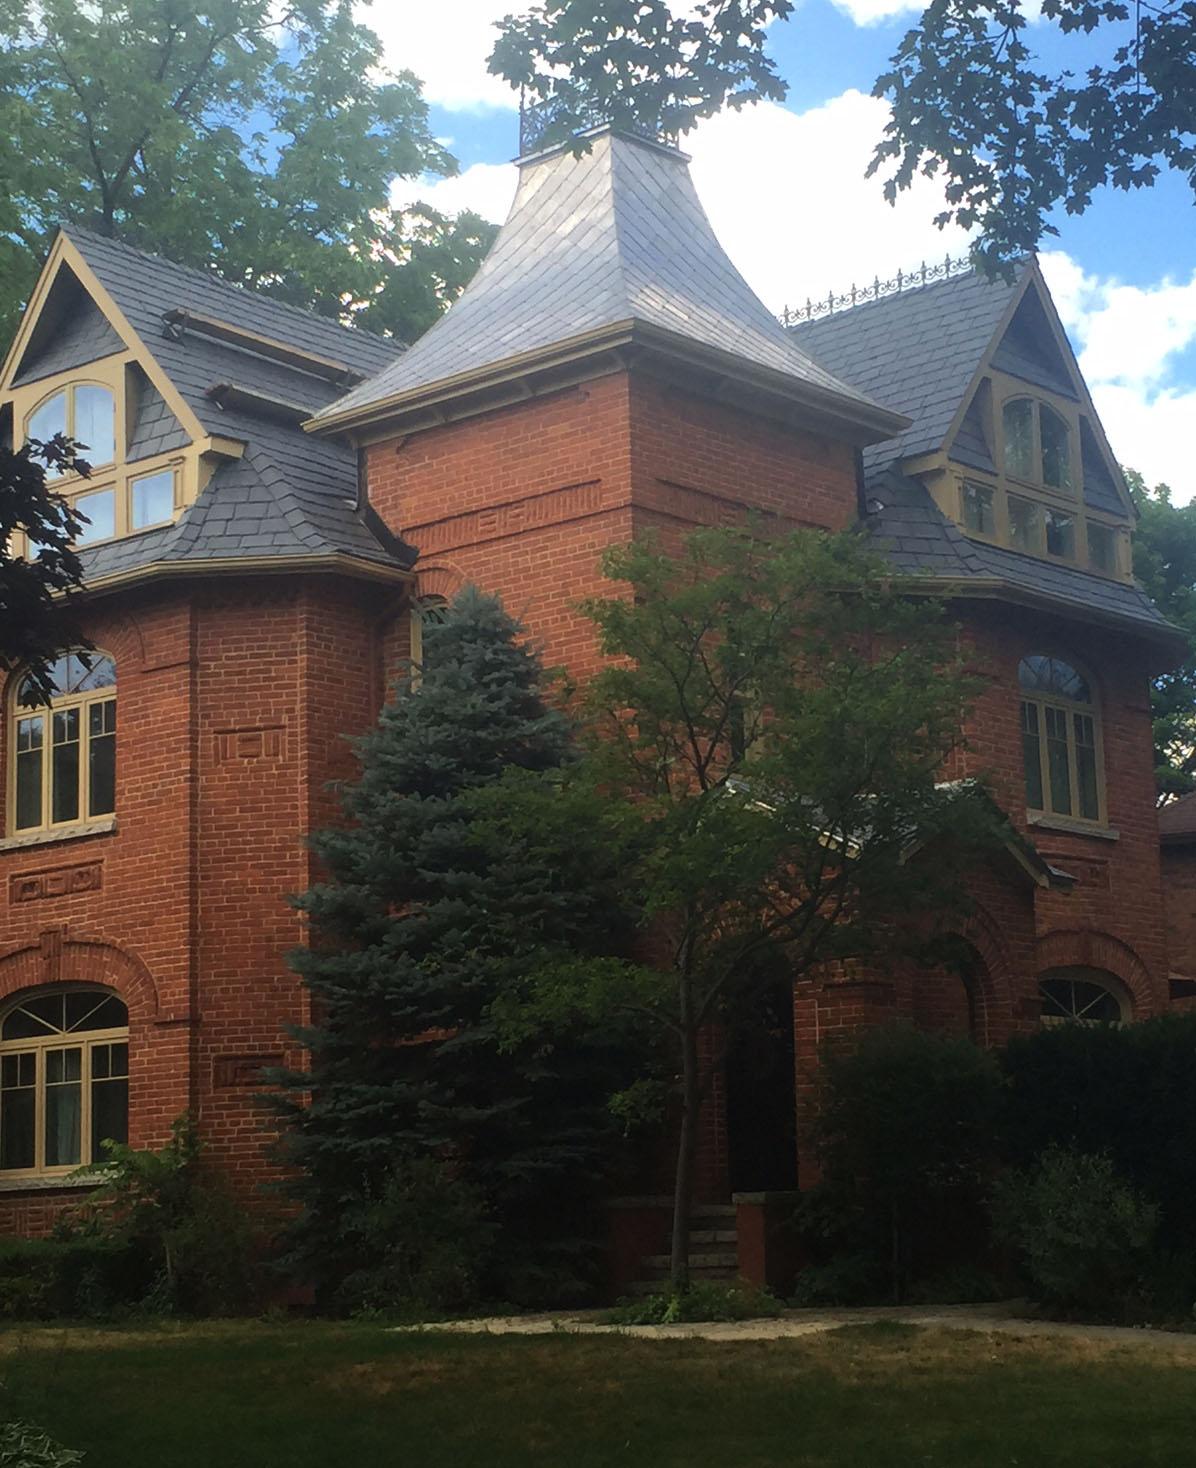 davinci roof on historic brick home